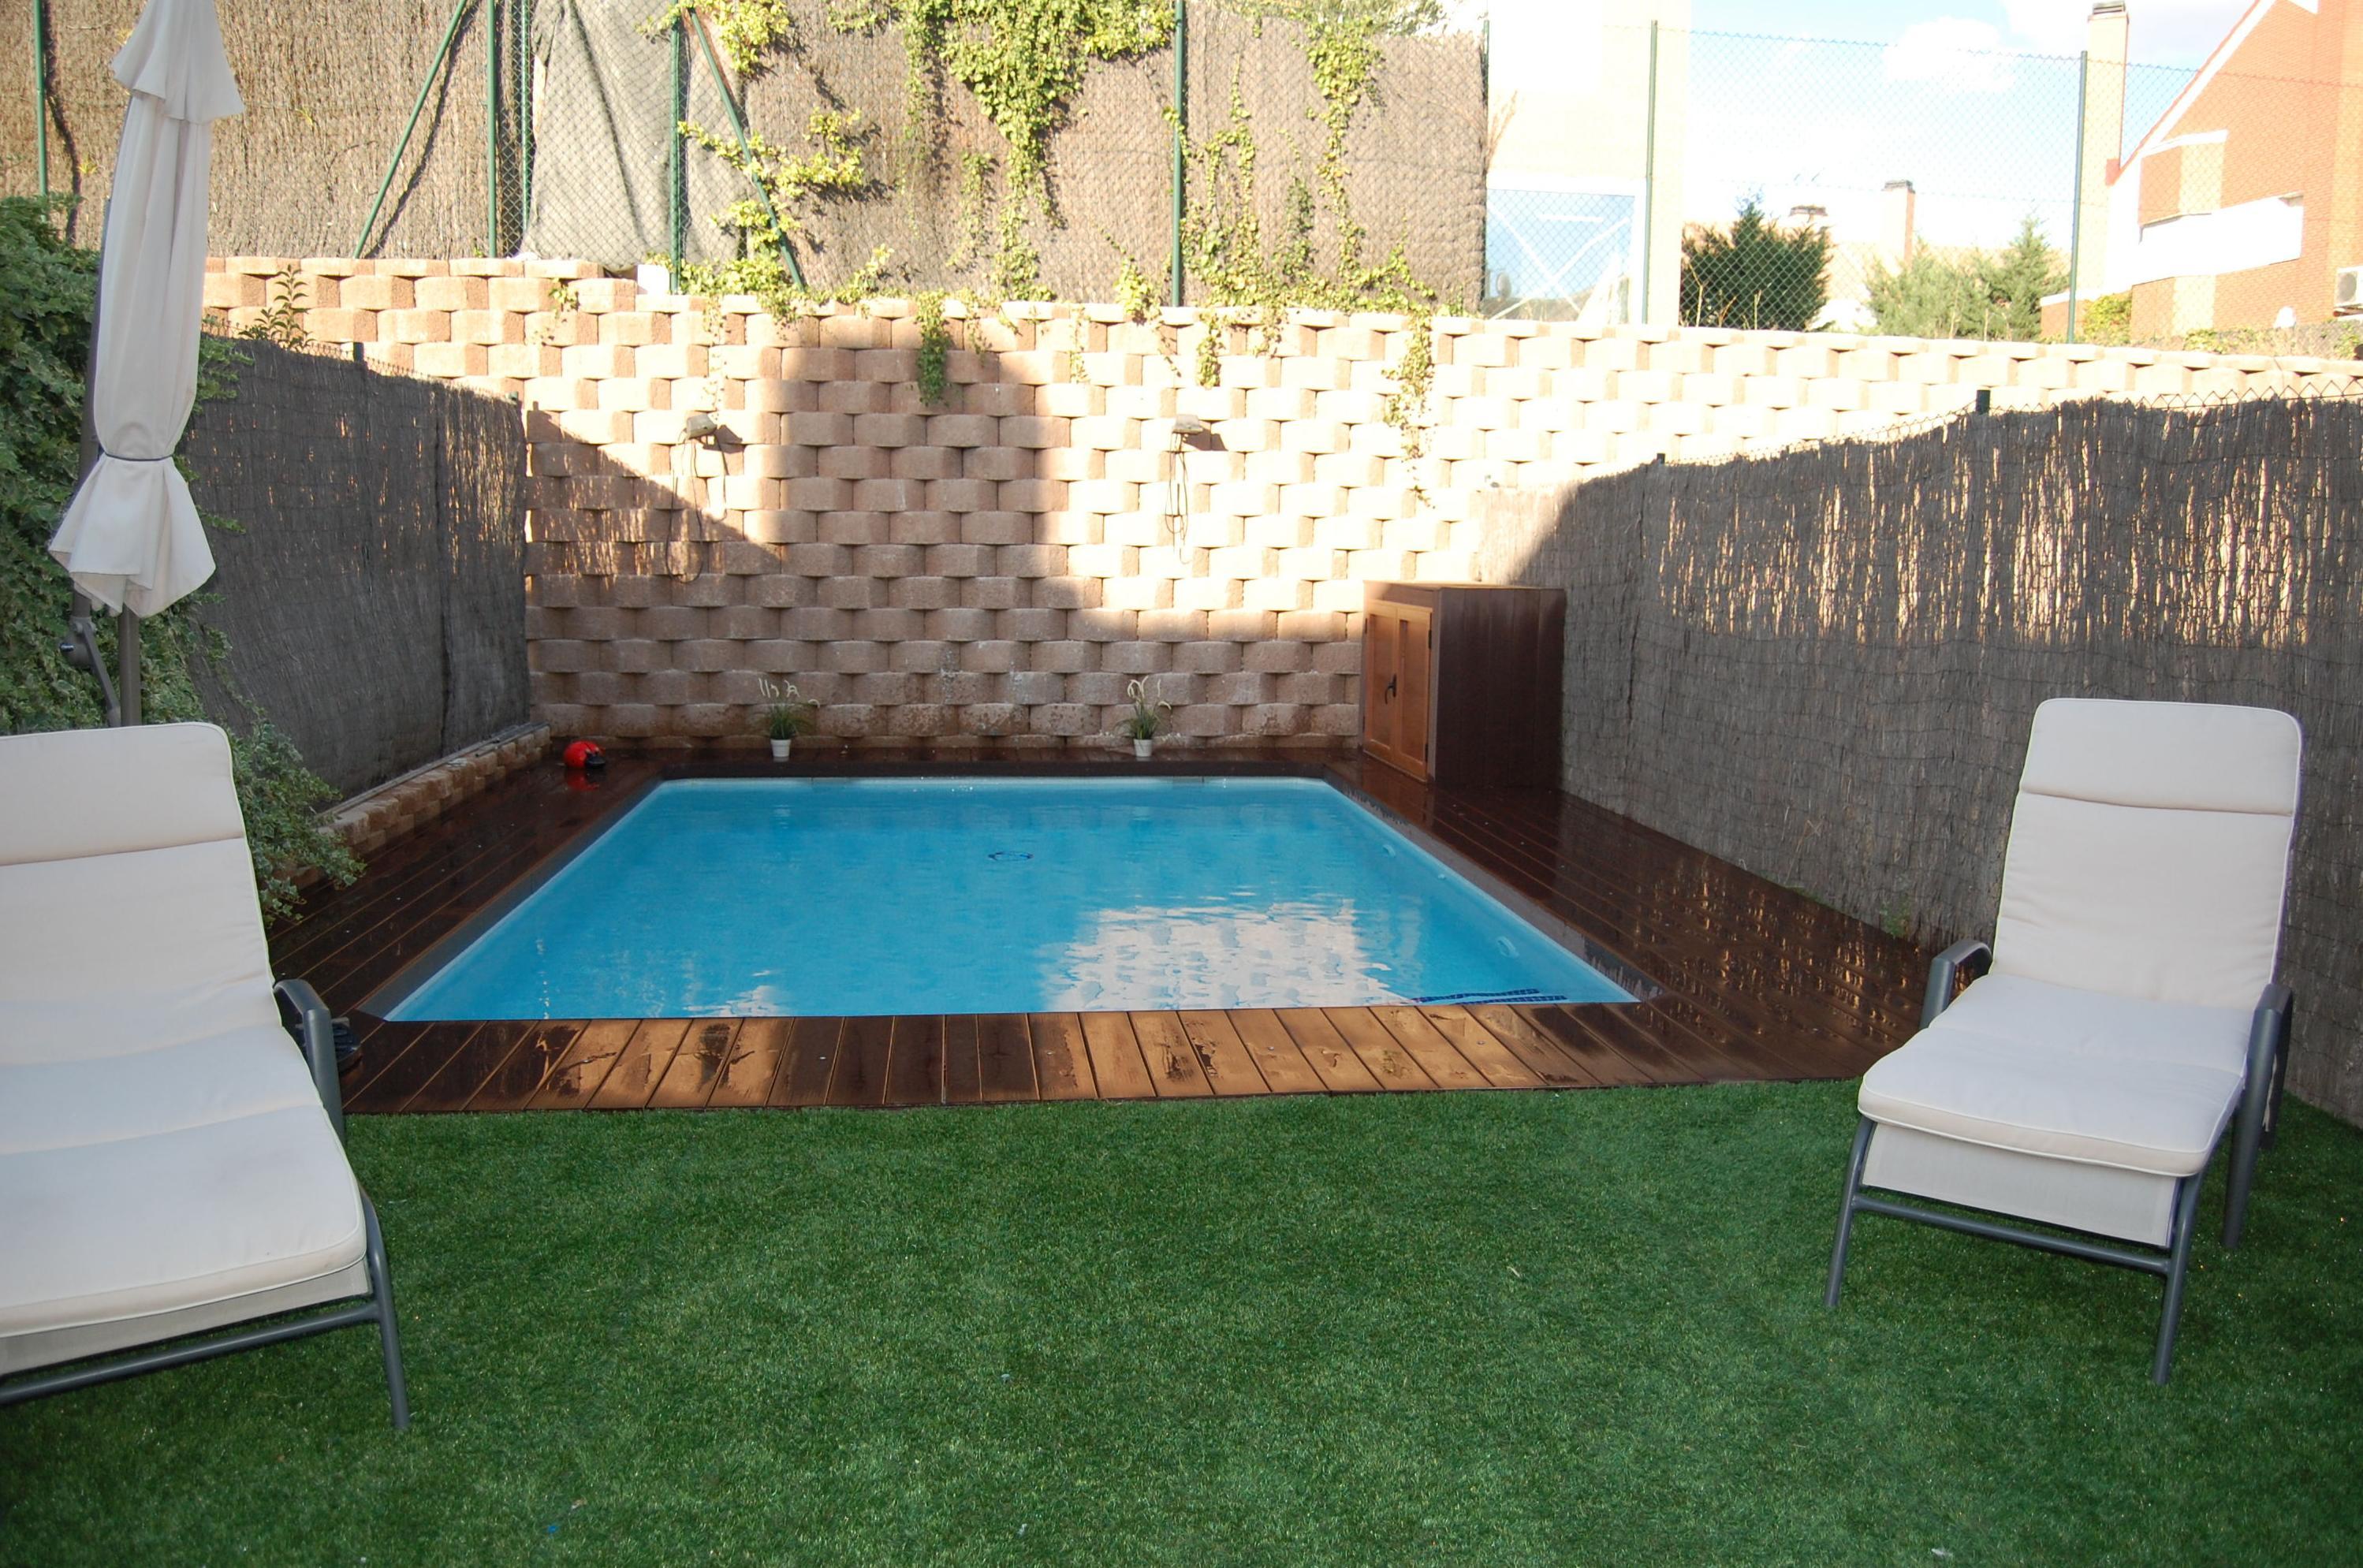 Lujoso coste piscina vi eta ideas de decoraci n de for Piscinas talavera